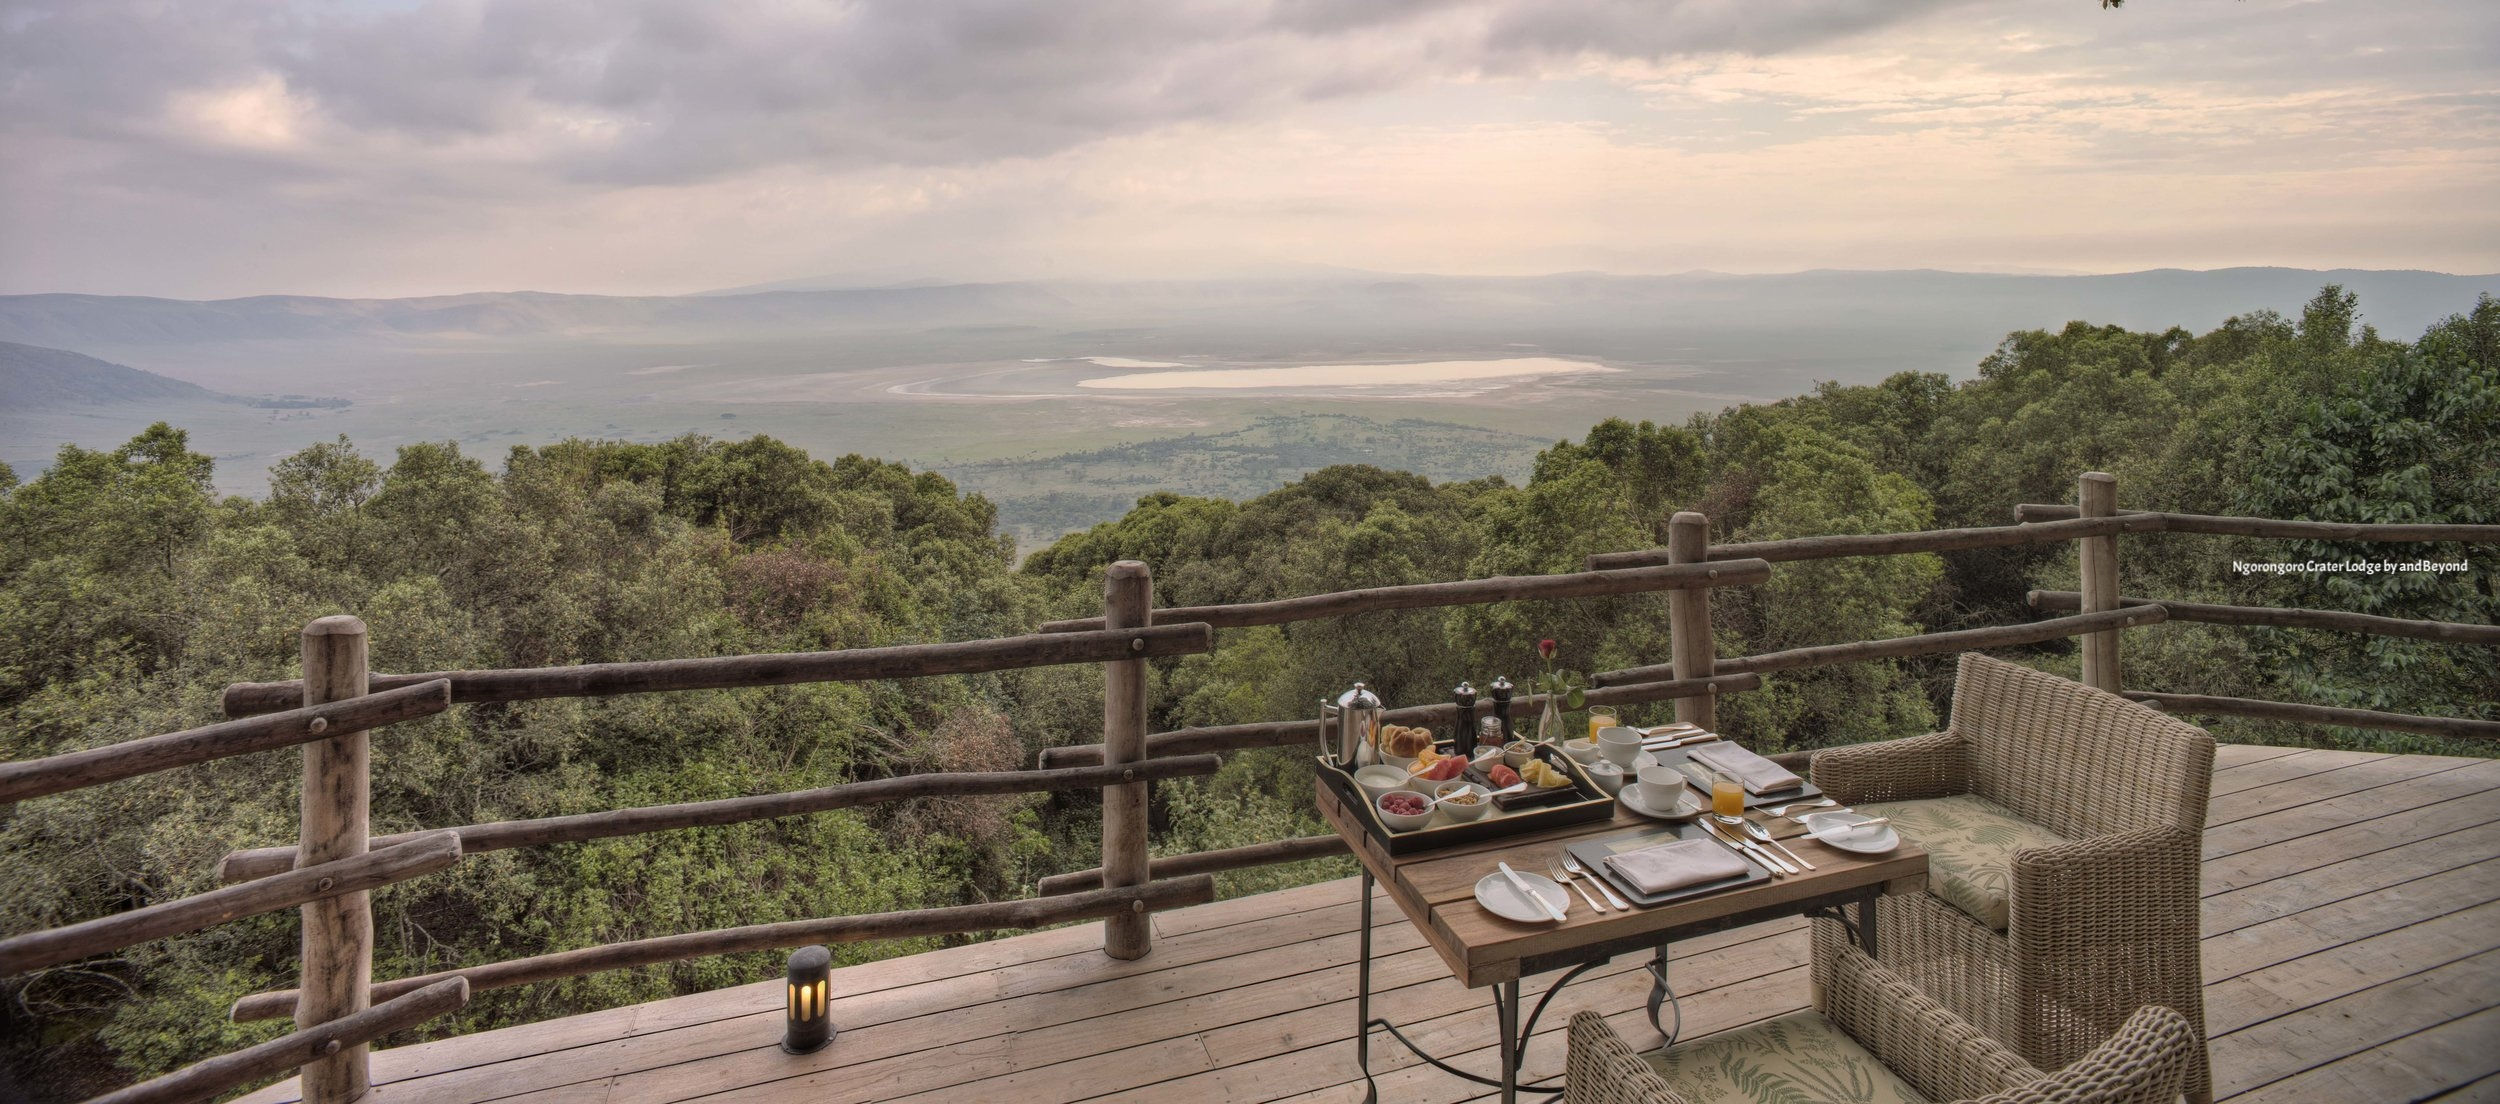 andbeyond_ngorongoro_crater_lodge_view_takims_holidays.jpg